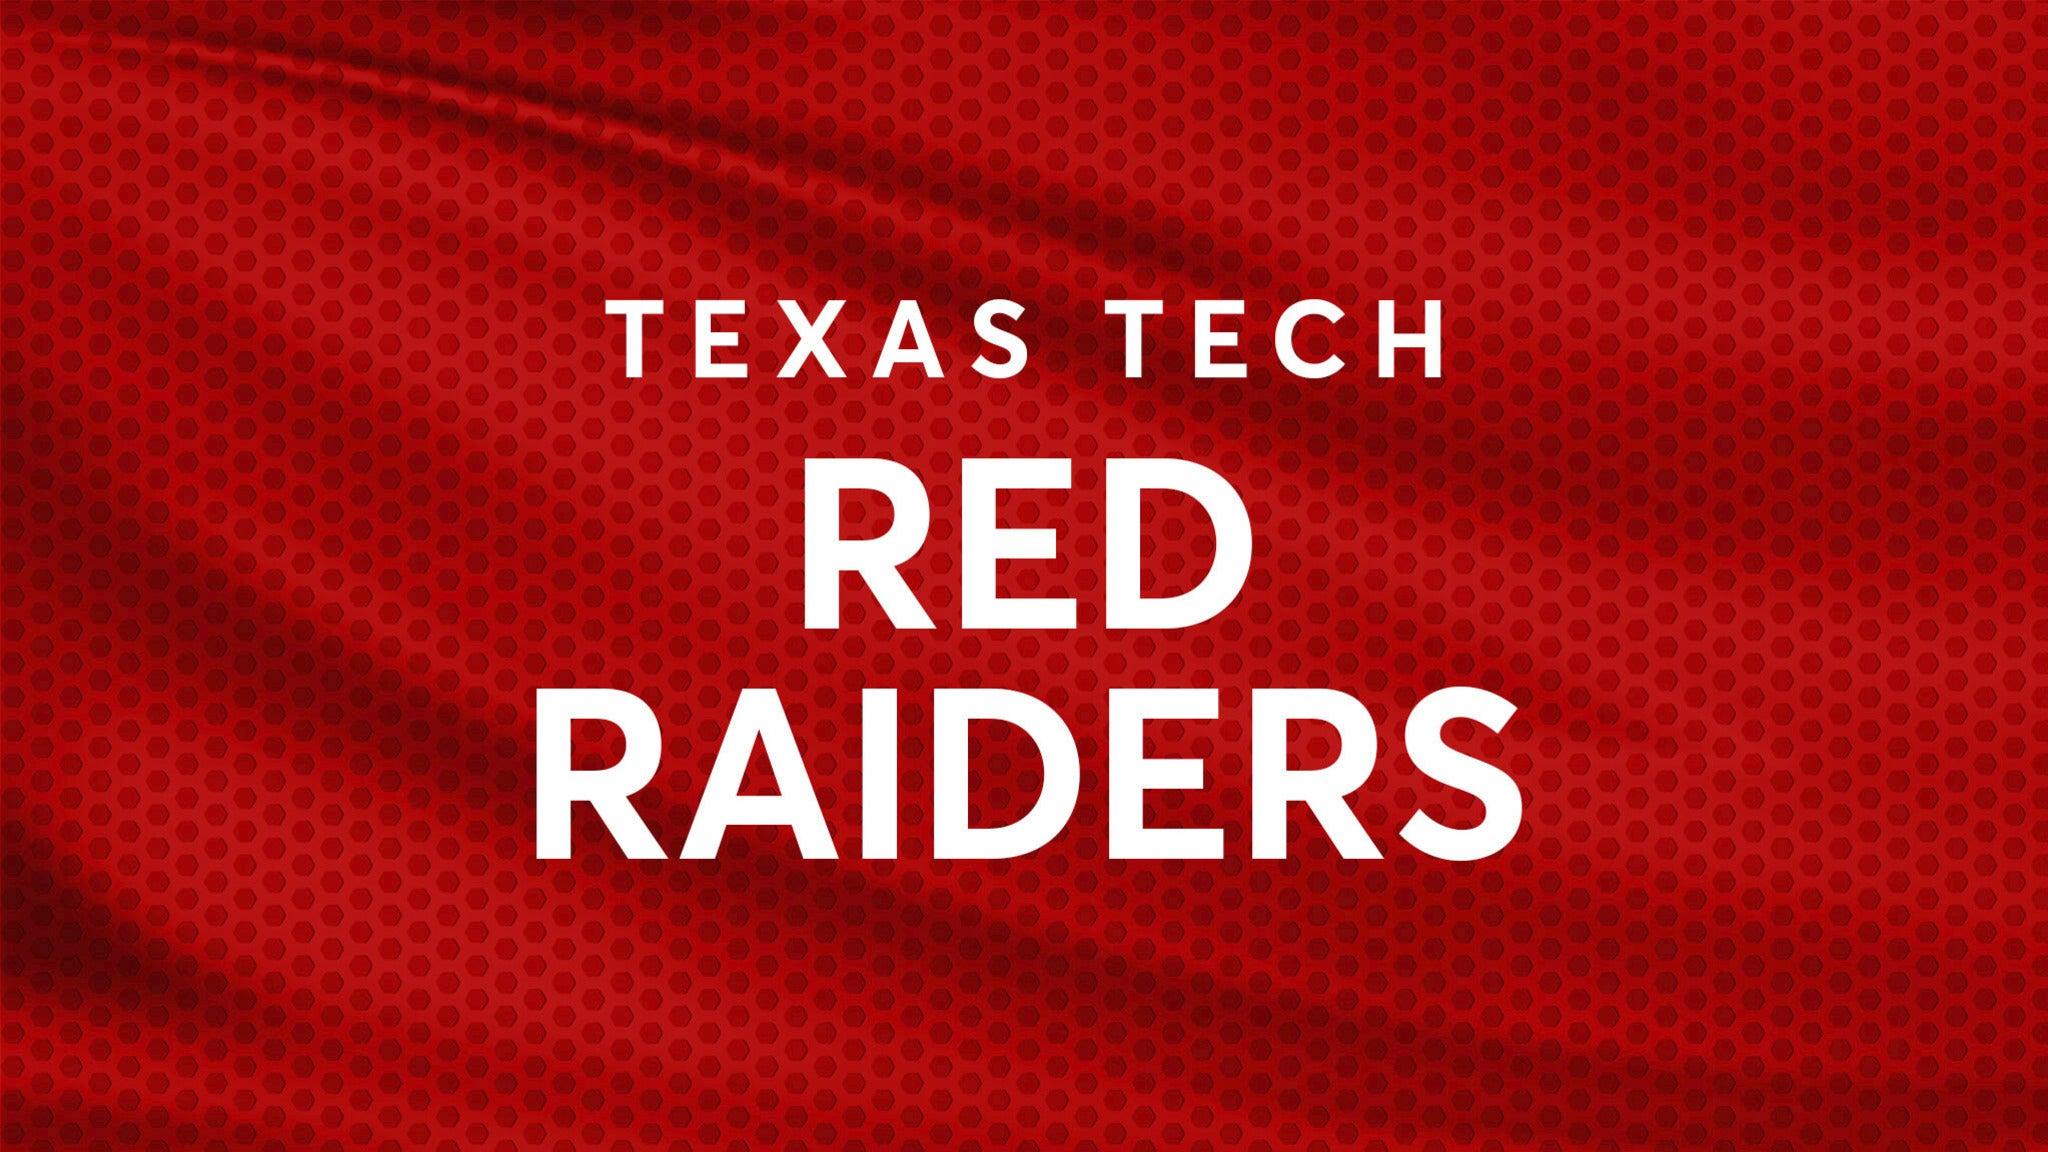 Texas Tech Red Raiders Mens Basketball